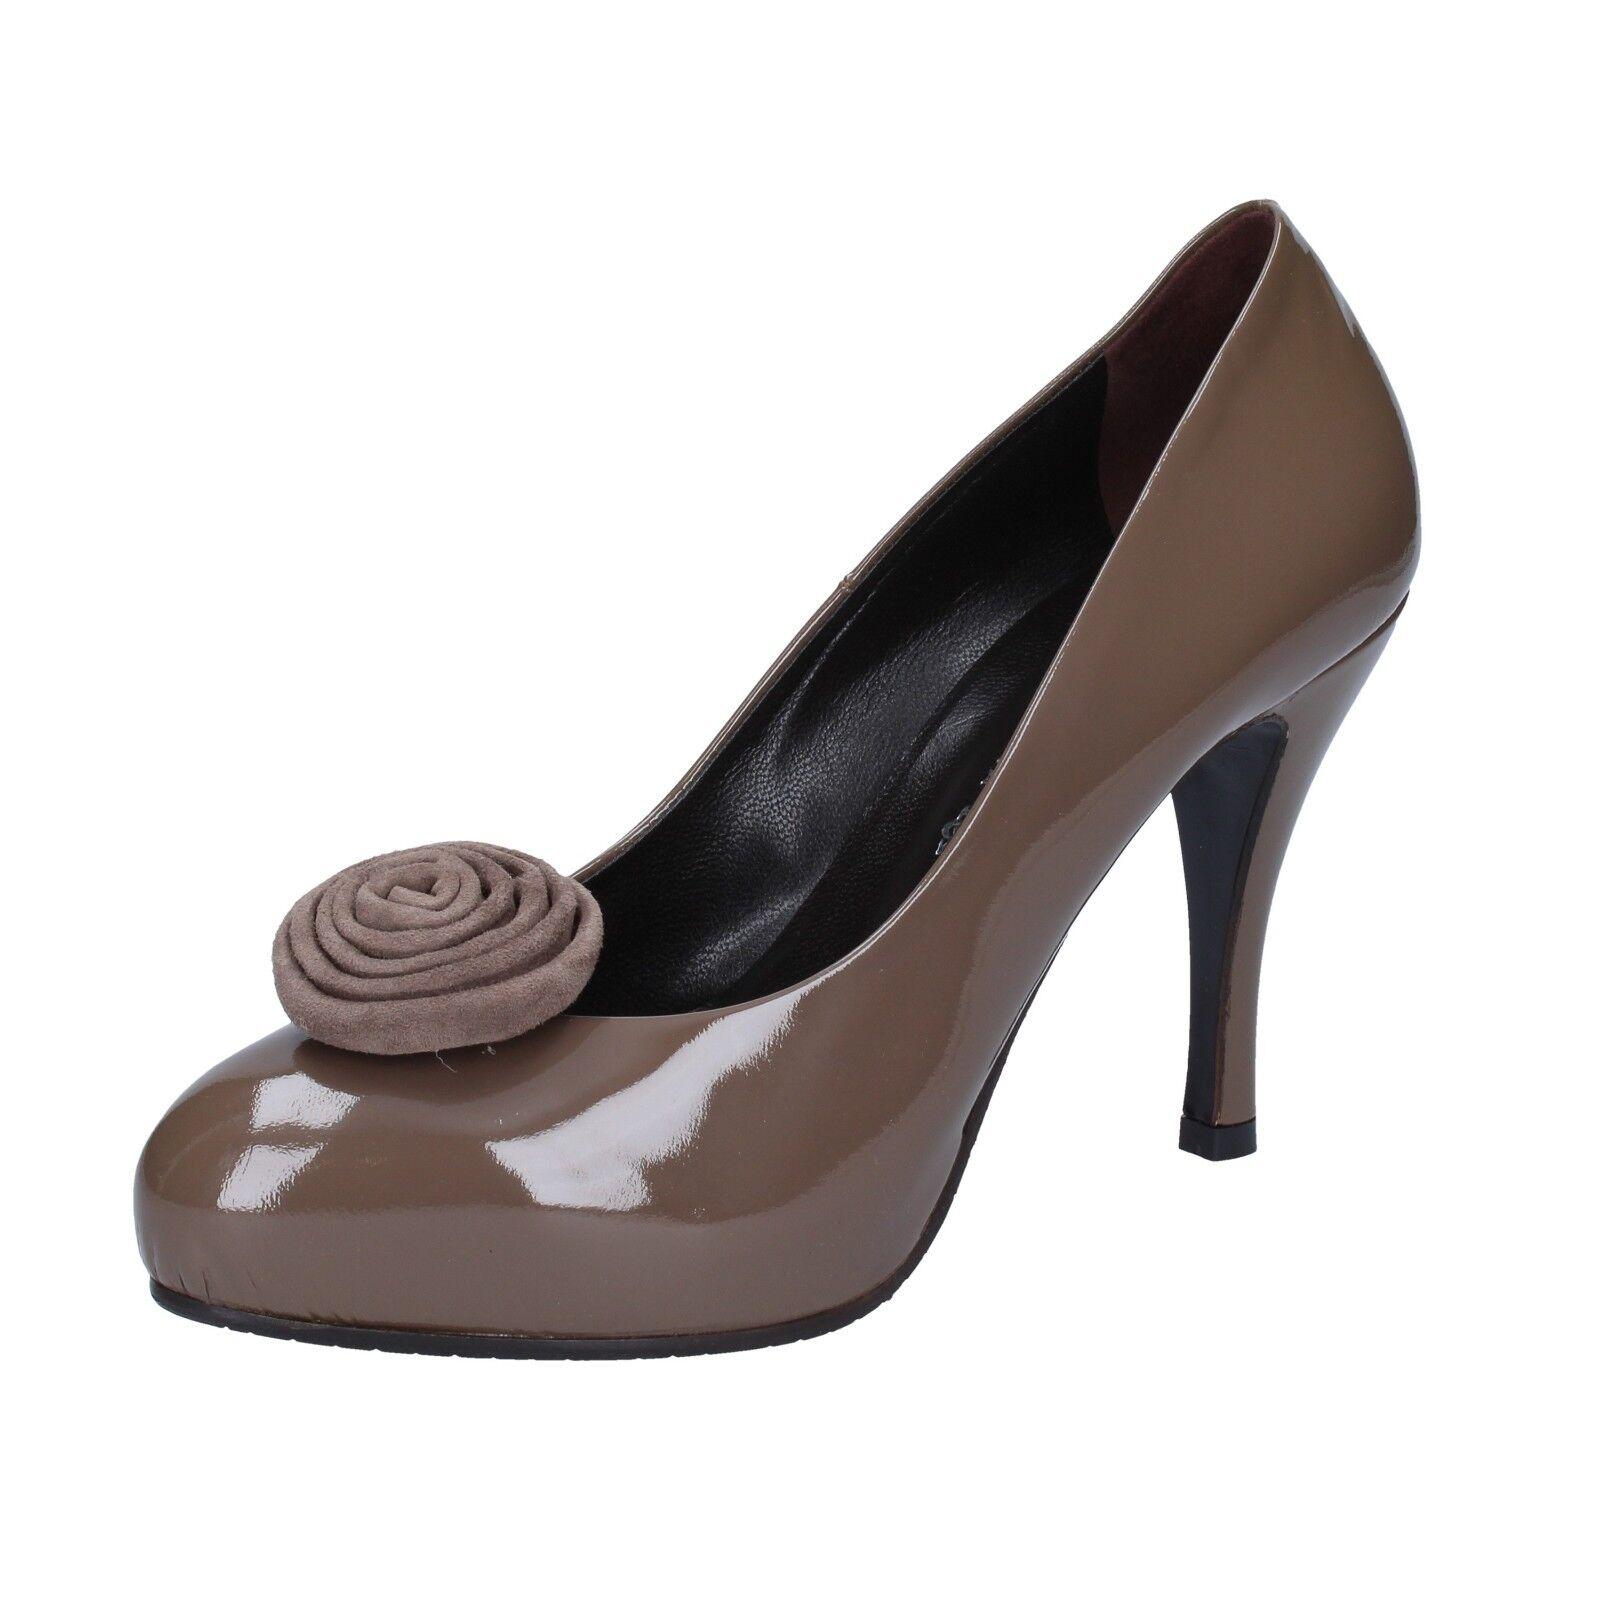 Women's shoes GUIDO SGARIGLIA 8 (EU 38) pumps brown patent leather AY118-38